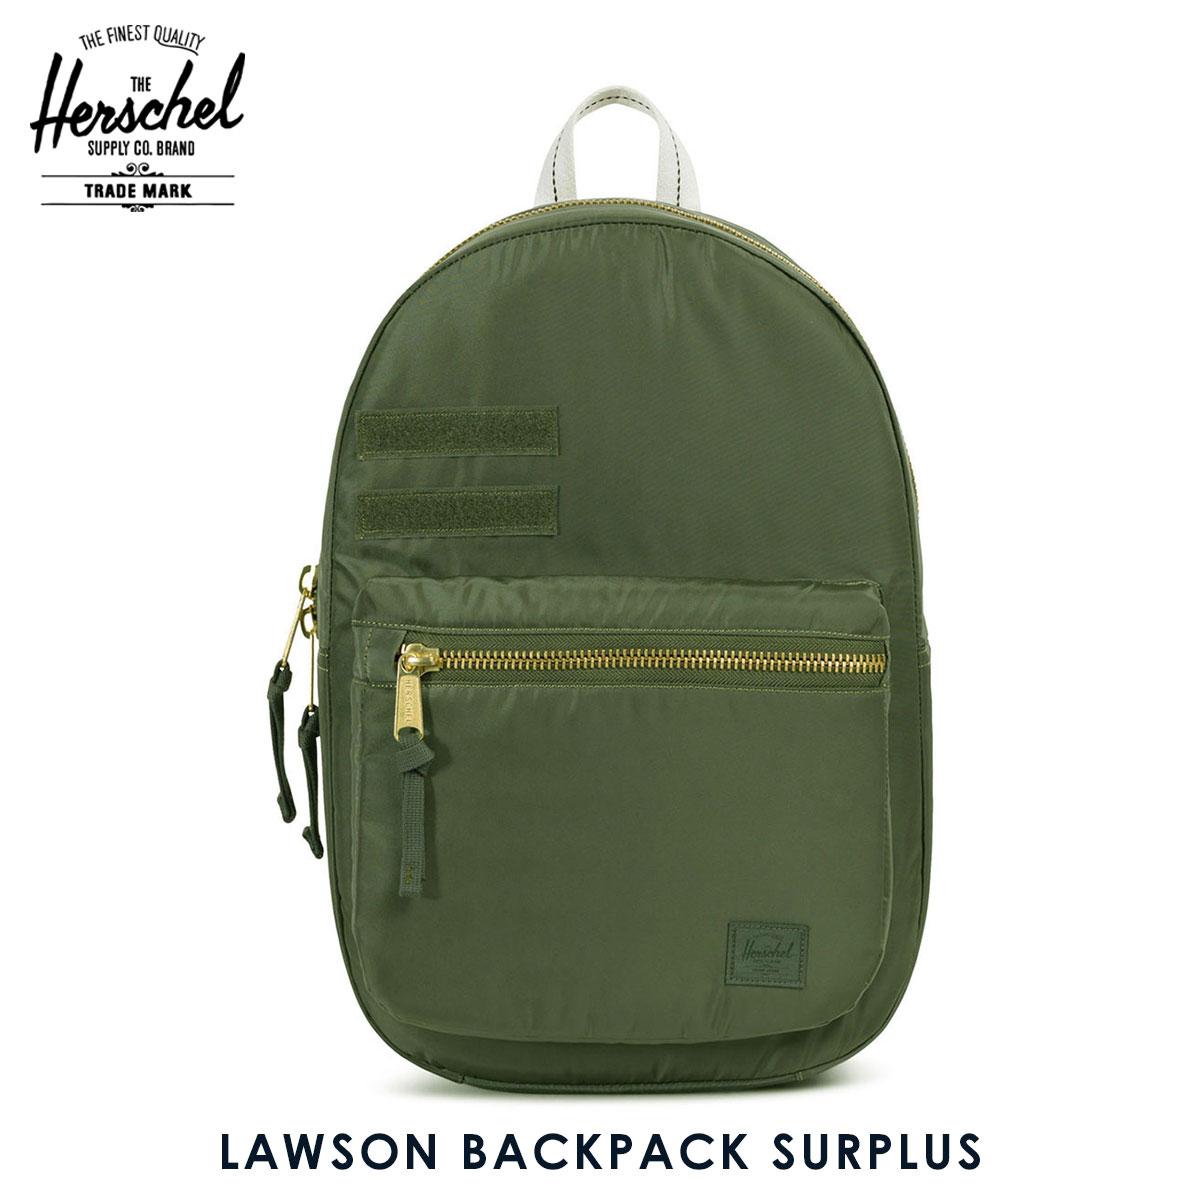 ef18b38be9e Hershel supply Herschel Supply regular store bag rucksack backpack LAWSON  BACKPACK SURPLUS 10179-01827-OS BEETLE